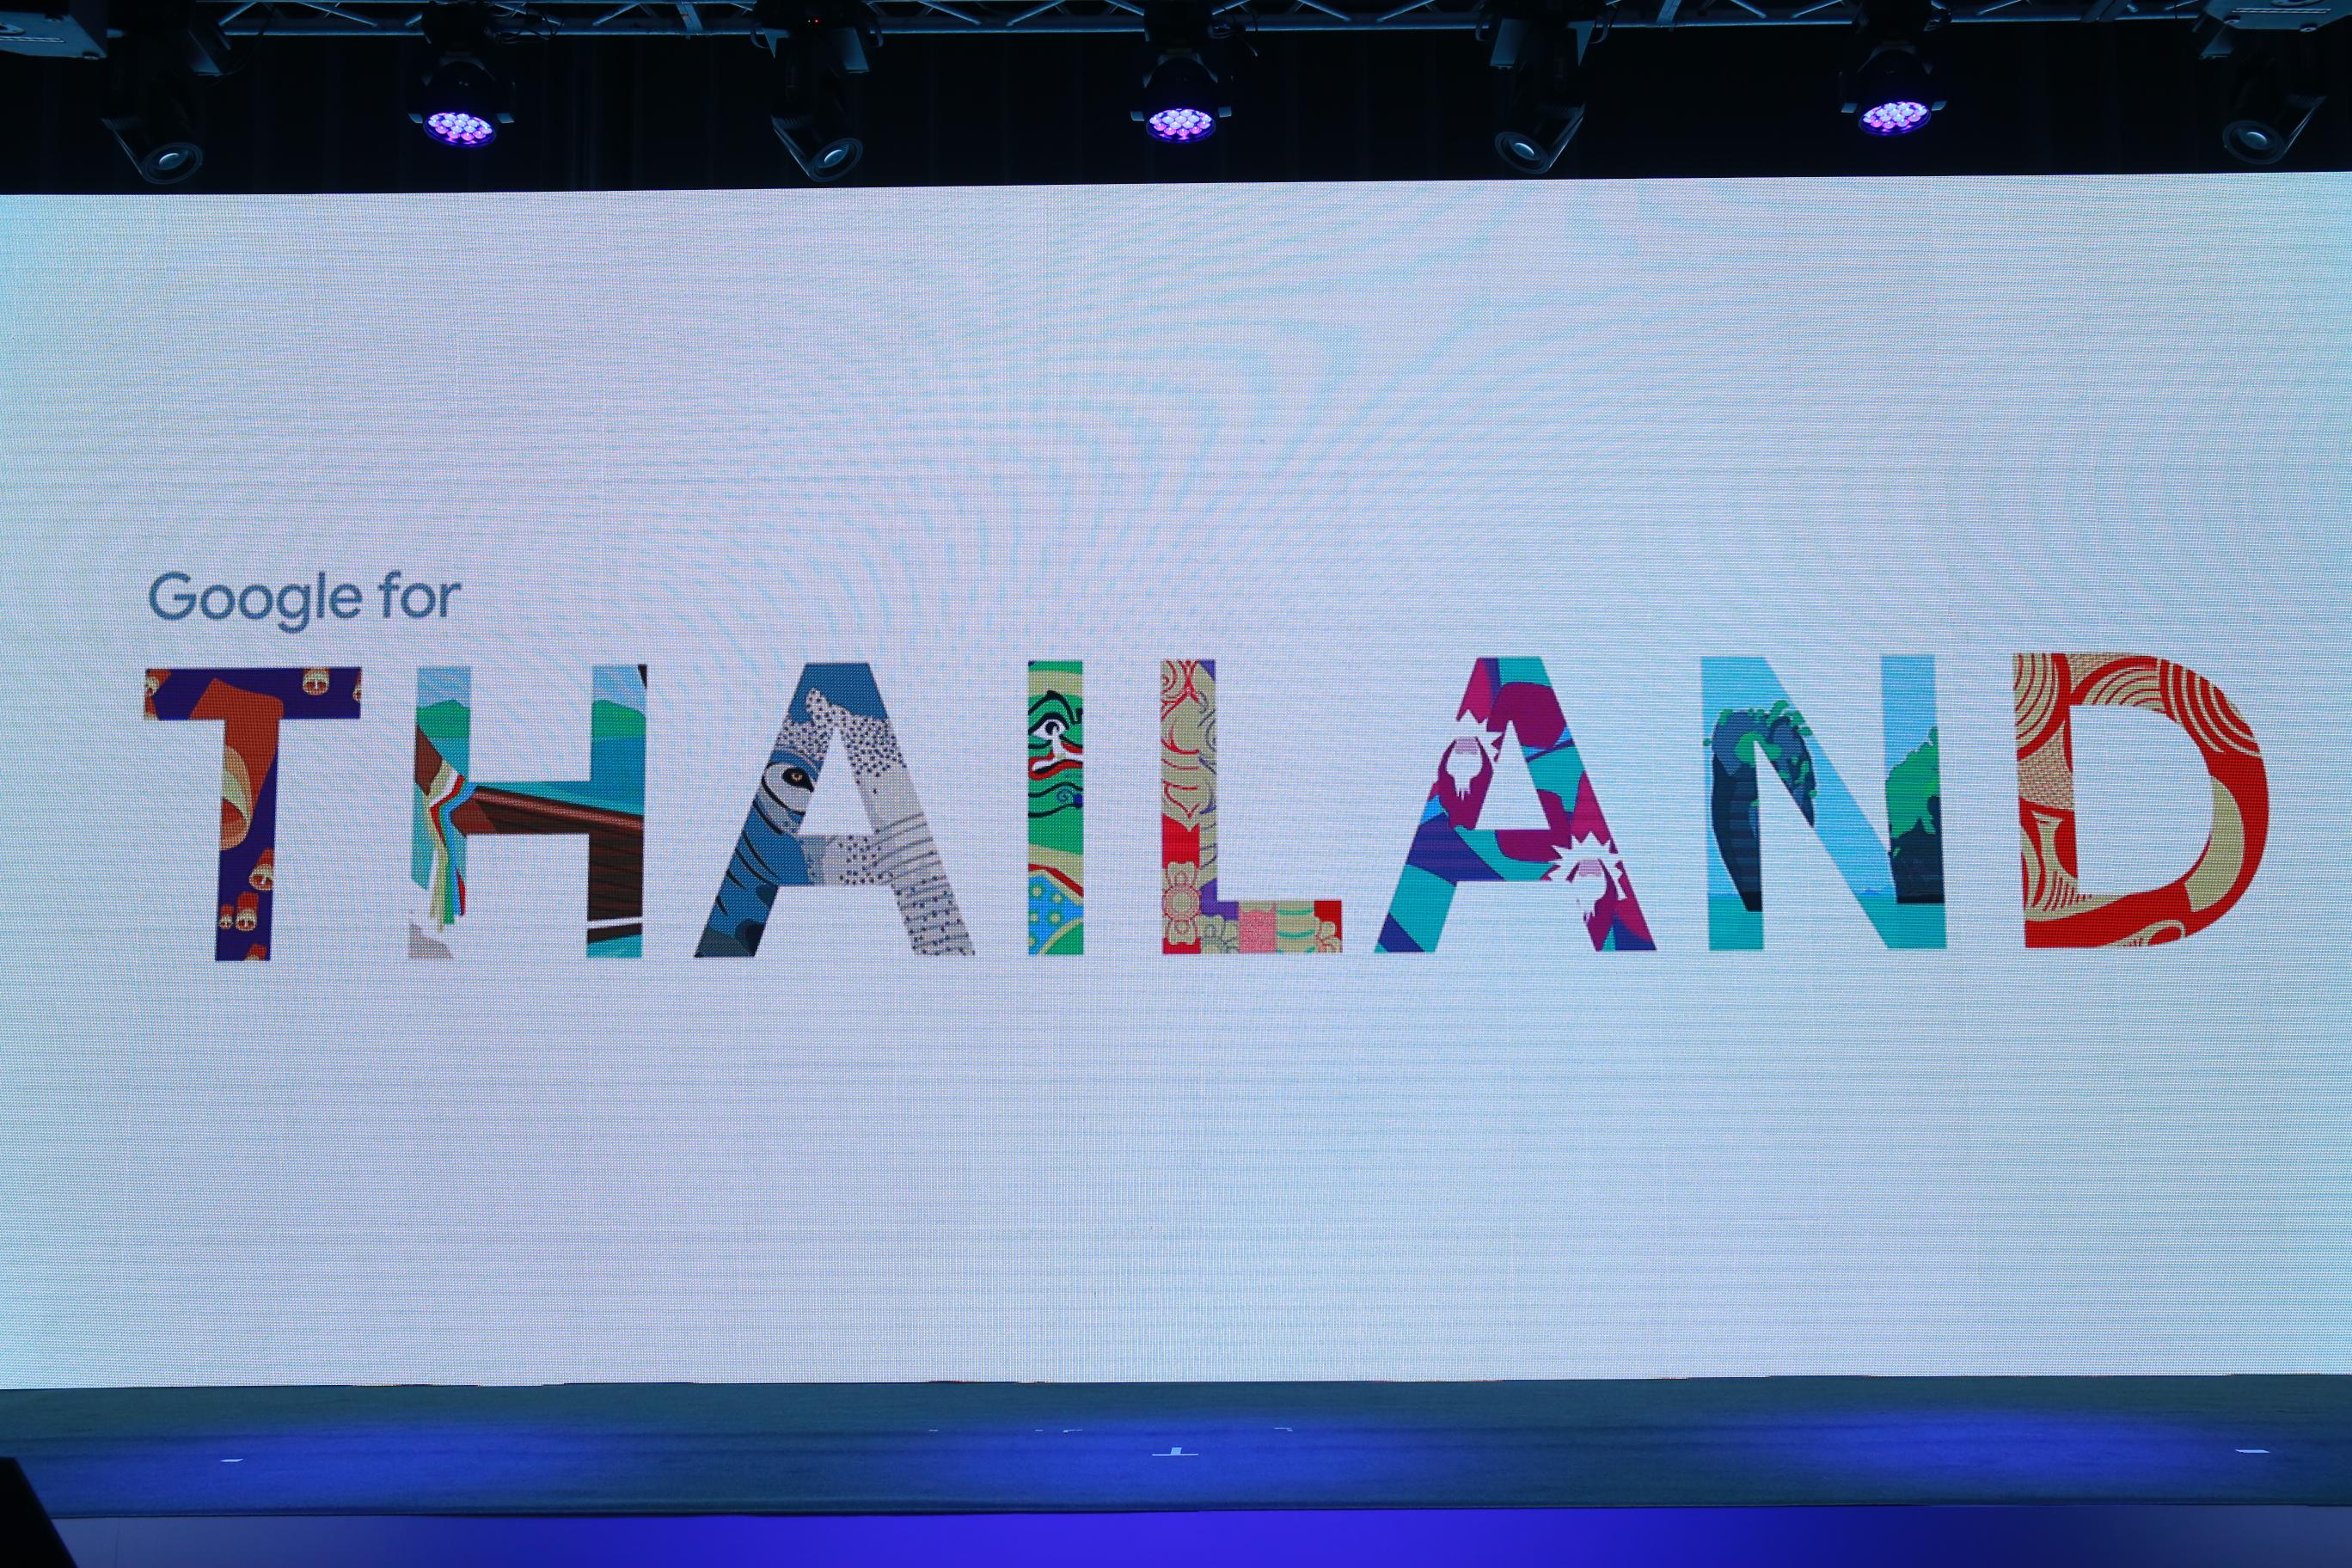 Google for Thailand กลยุทธ์ระดับประเทศ